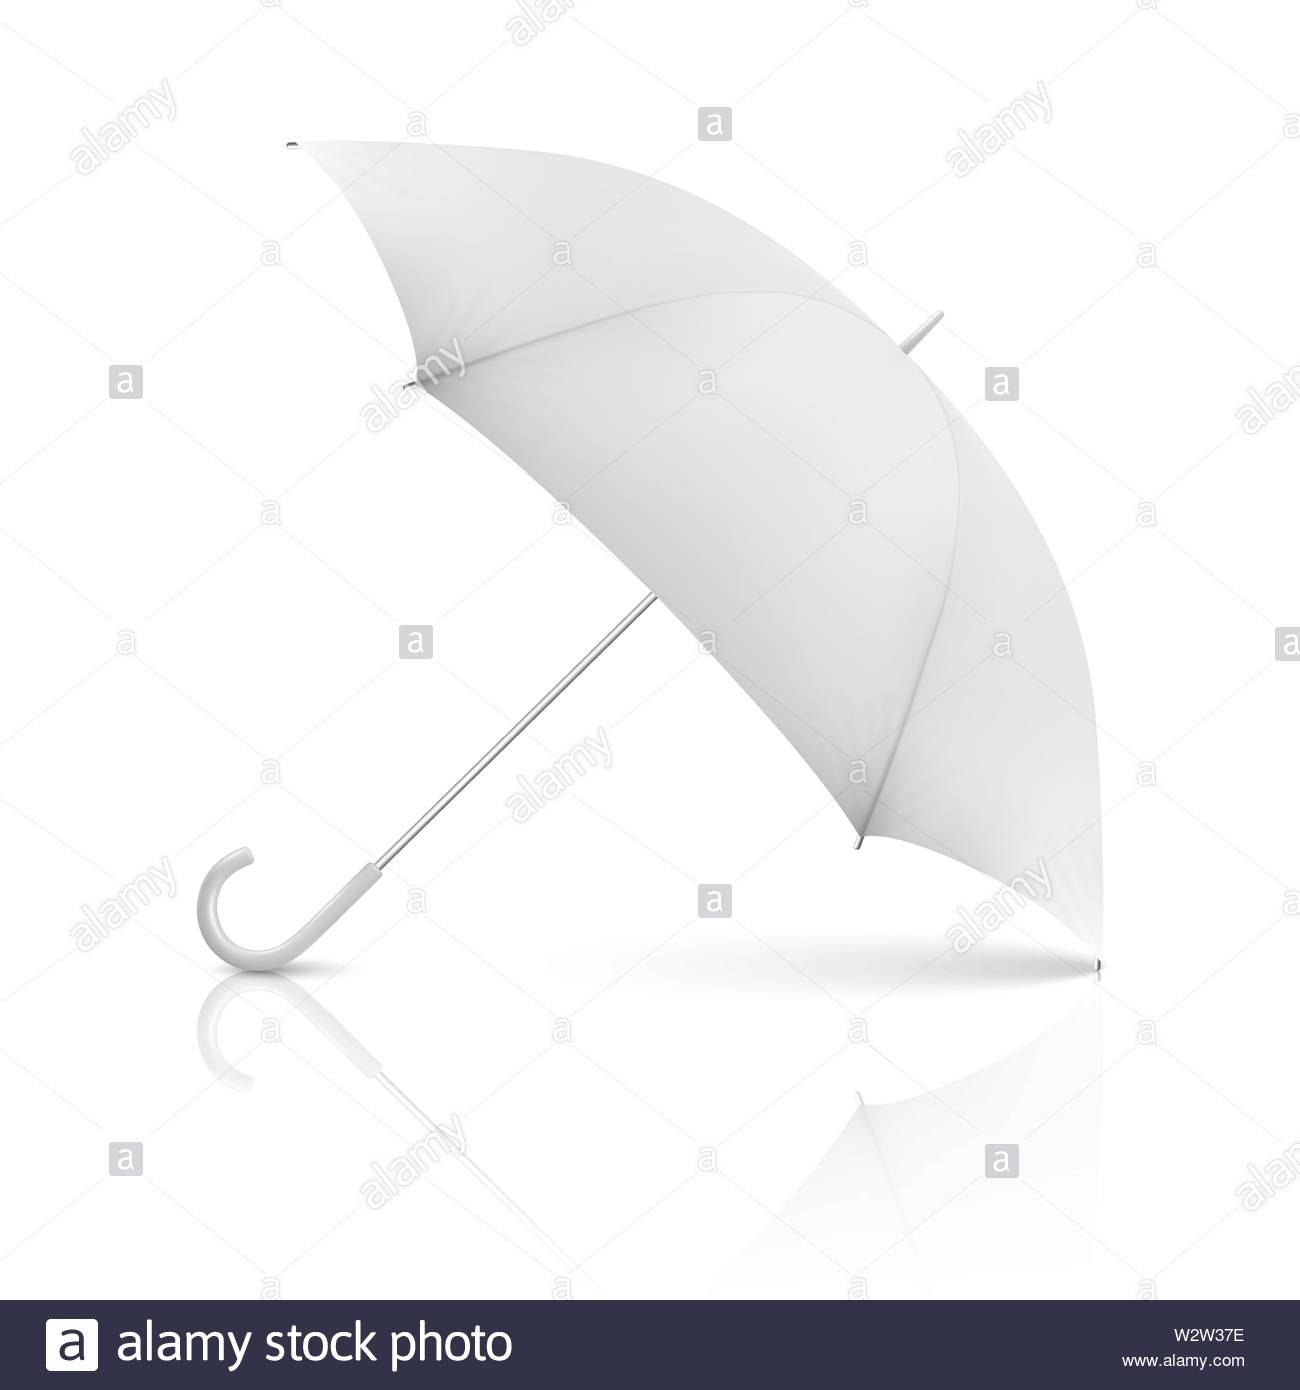 Vector D Realistic Render White Blank Umbrella Icon Closeup Throughout Blank Umbrella Template